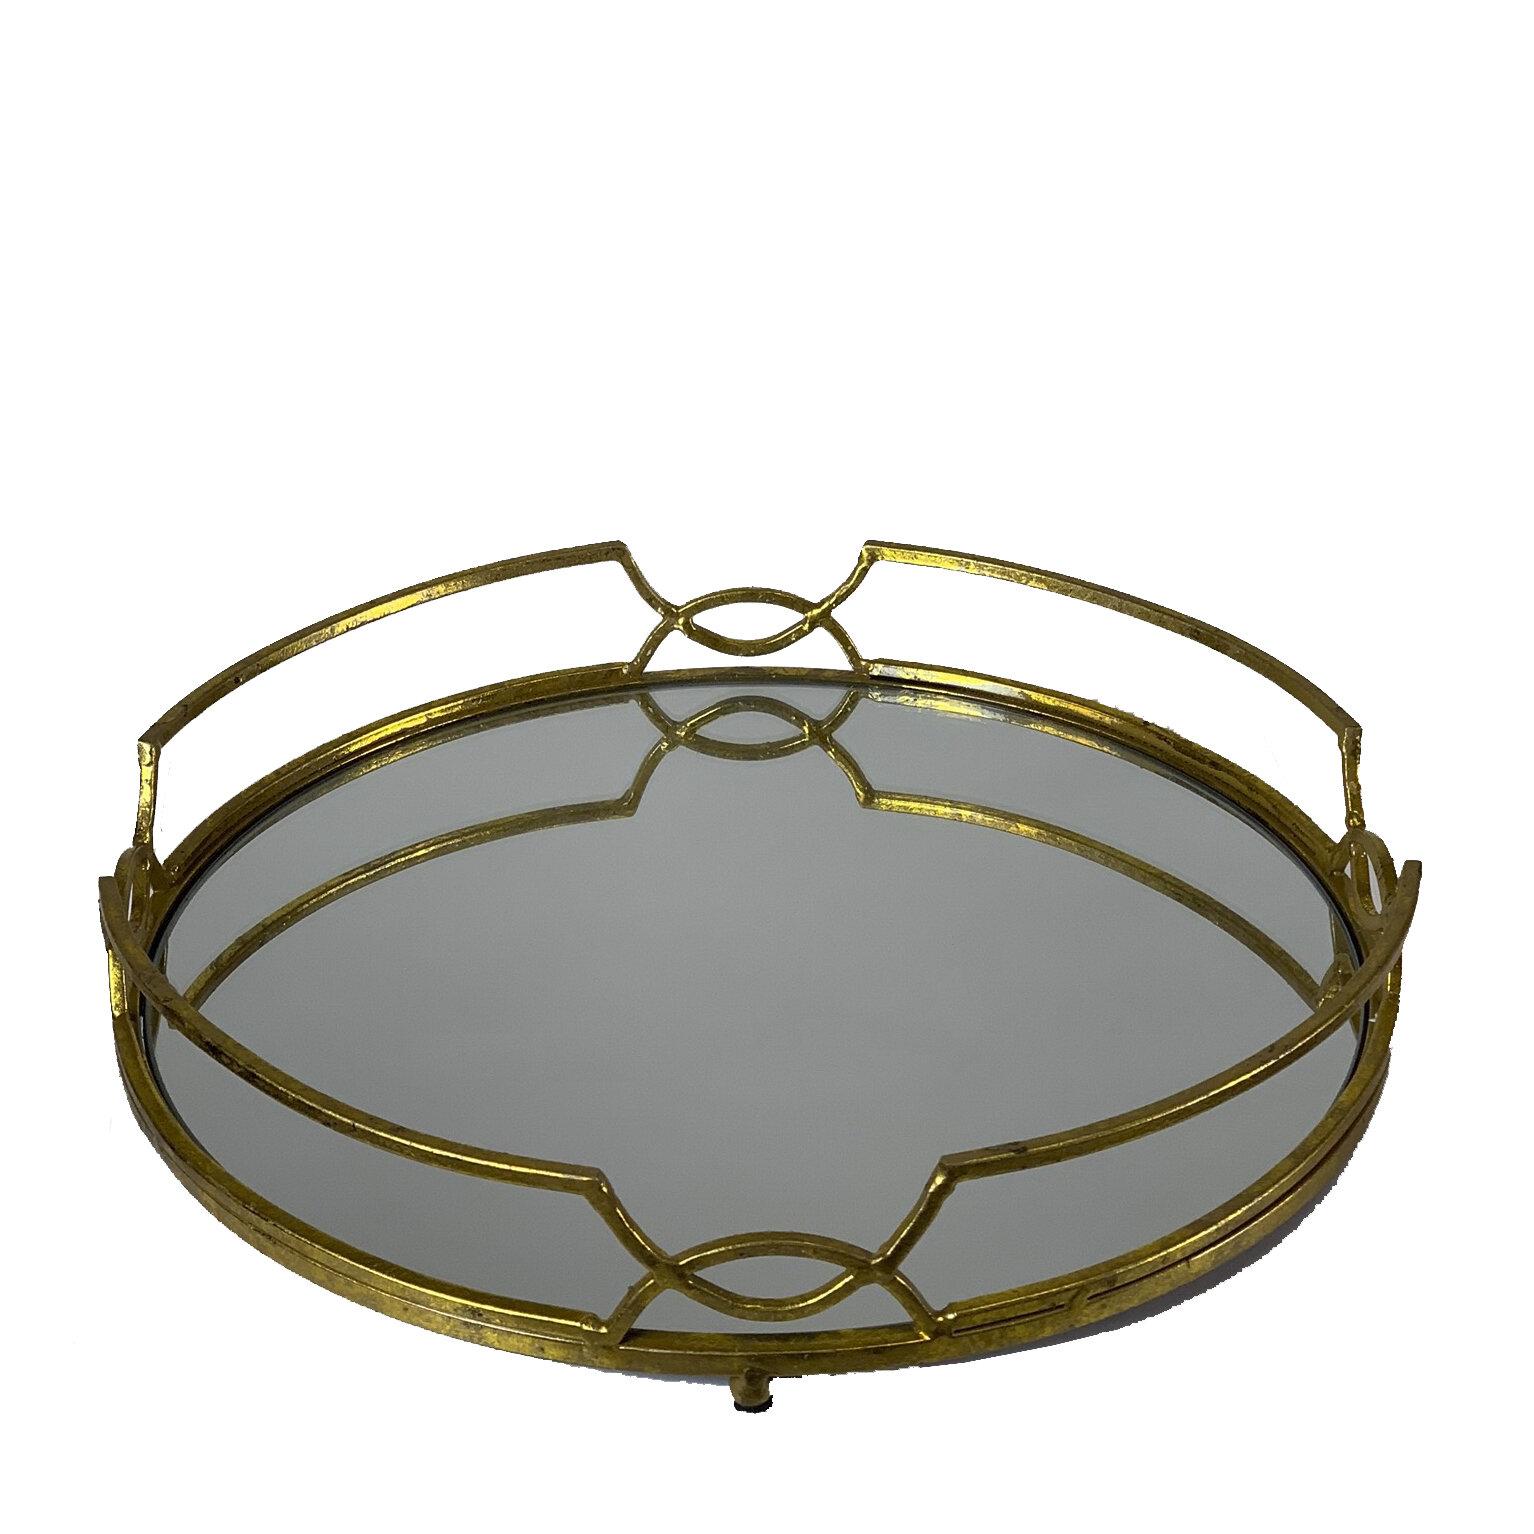 Modern Round Gold Mirror Serving Or Vanity Tray Zengenius Inc